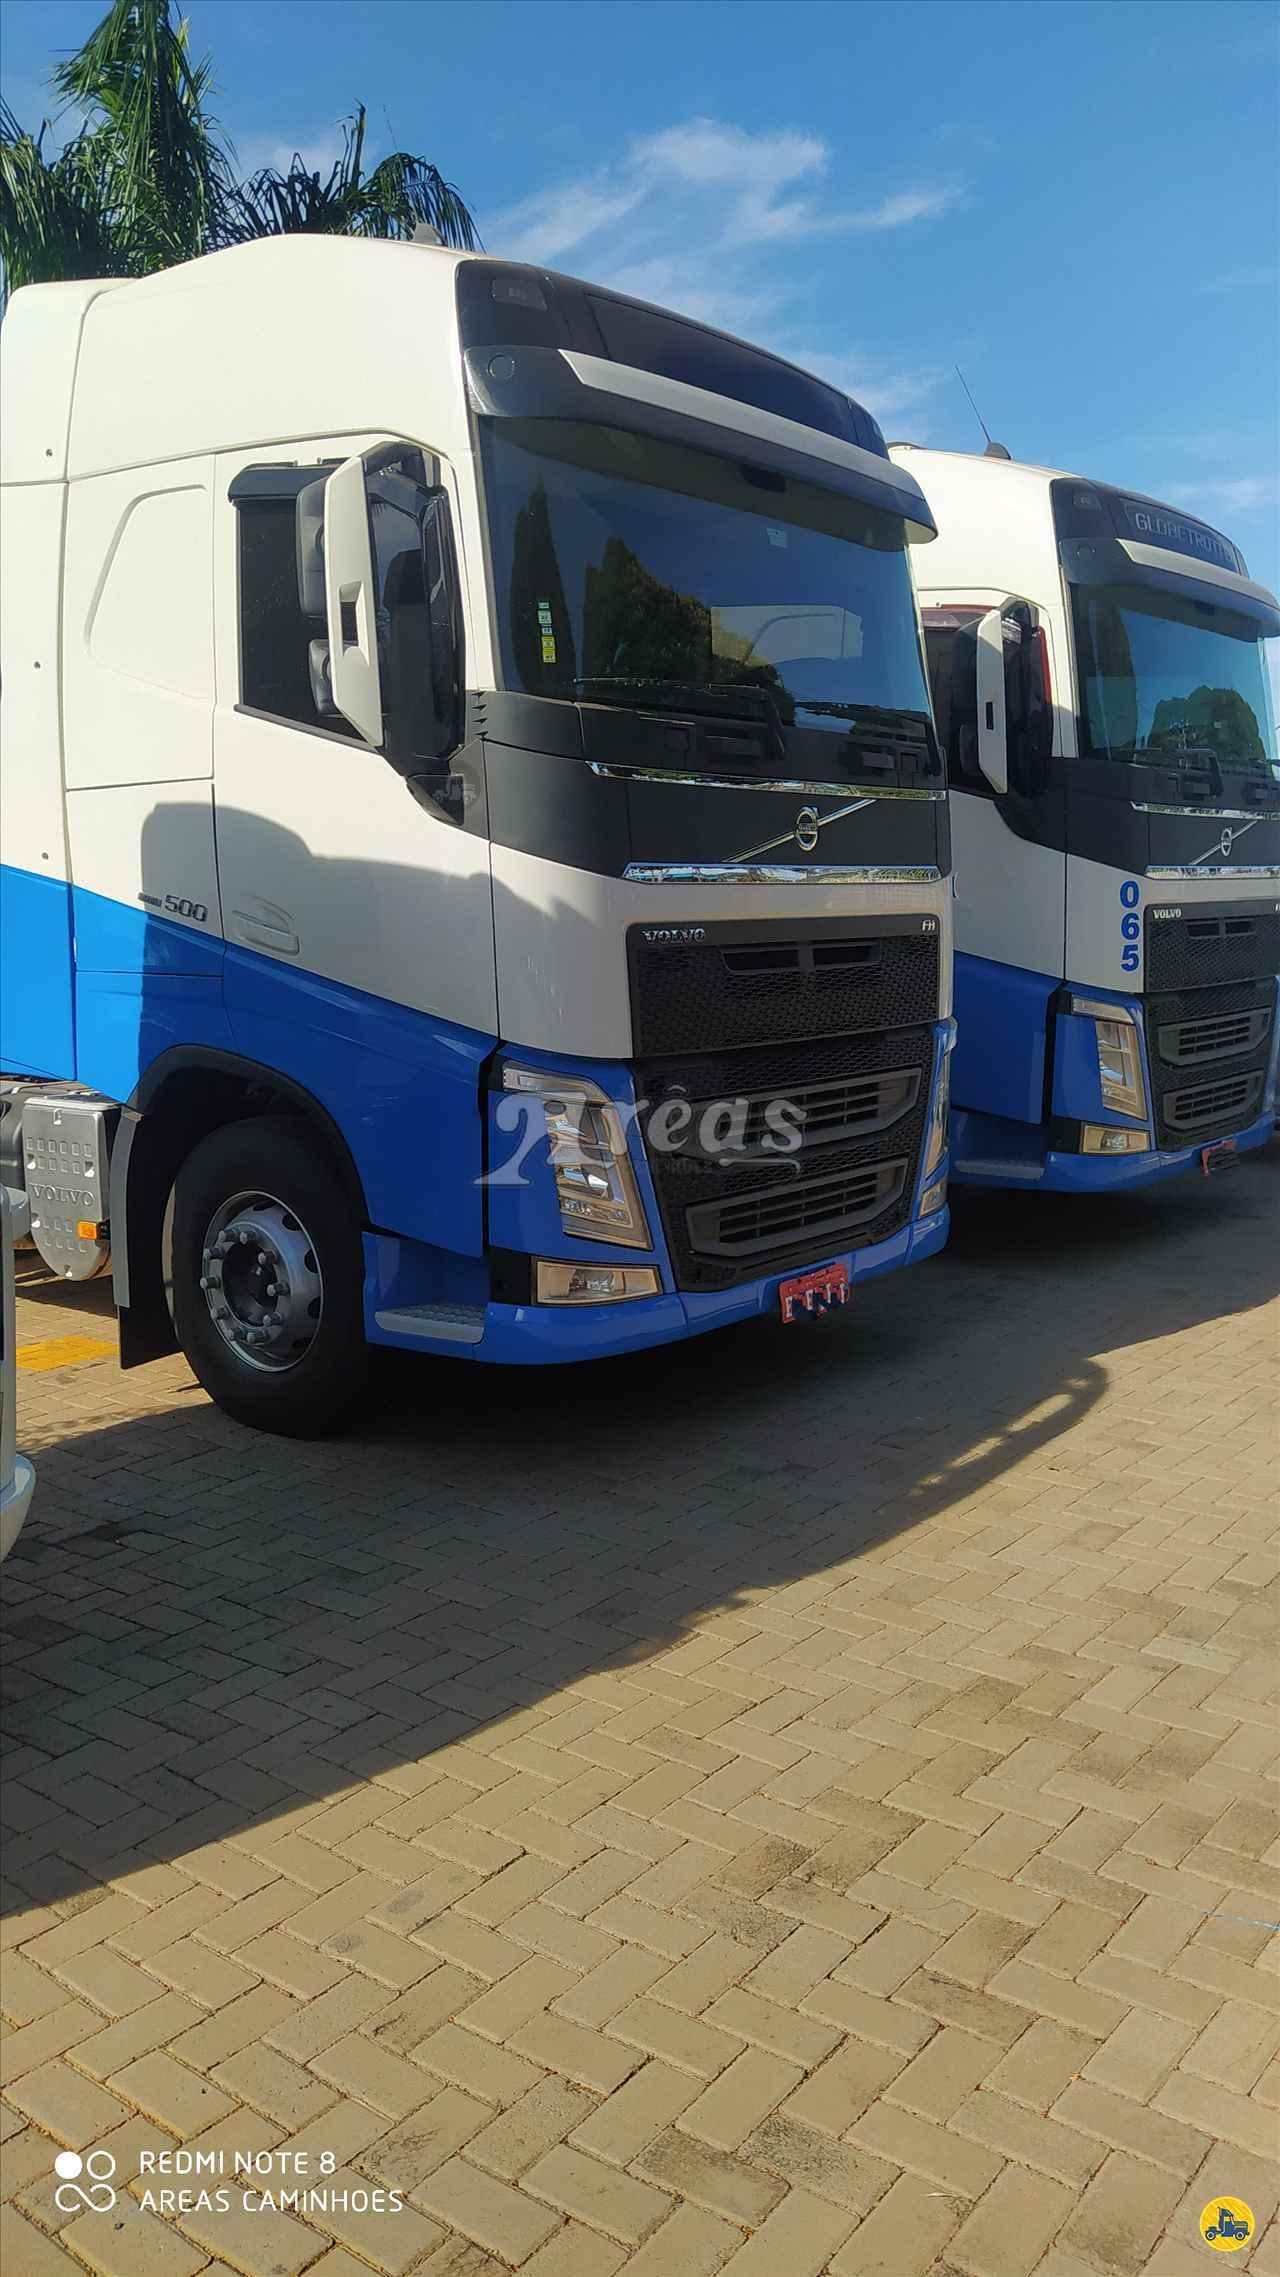 CAMINHAO VOLVO VOLVO FH 500 Cavalo Mecânico Truck 6x2 Arêas Caminhões MARINGA PARANÁ PR